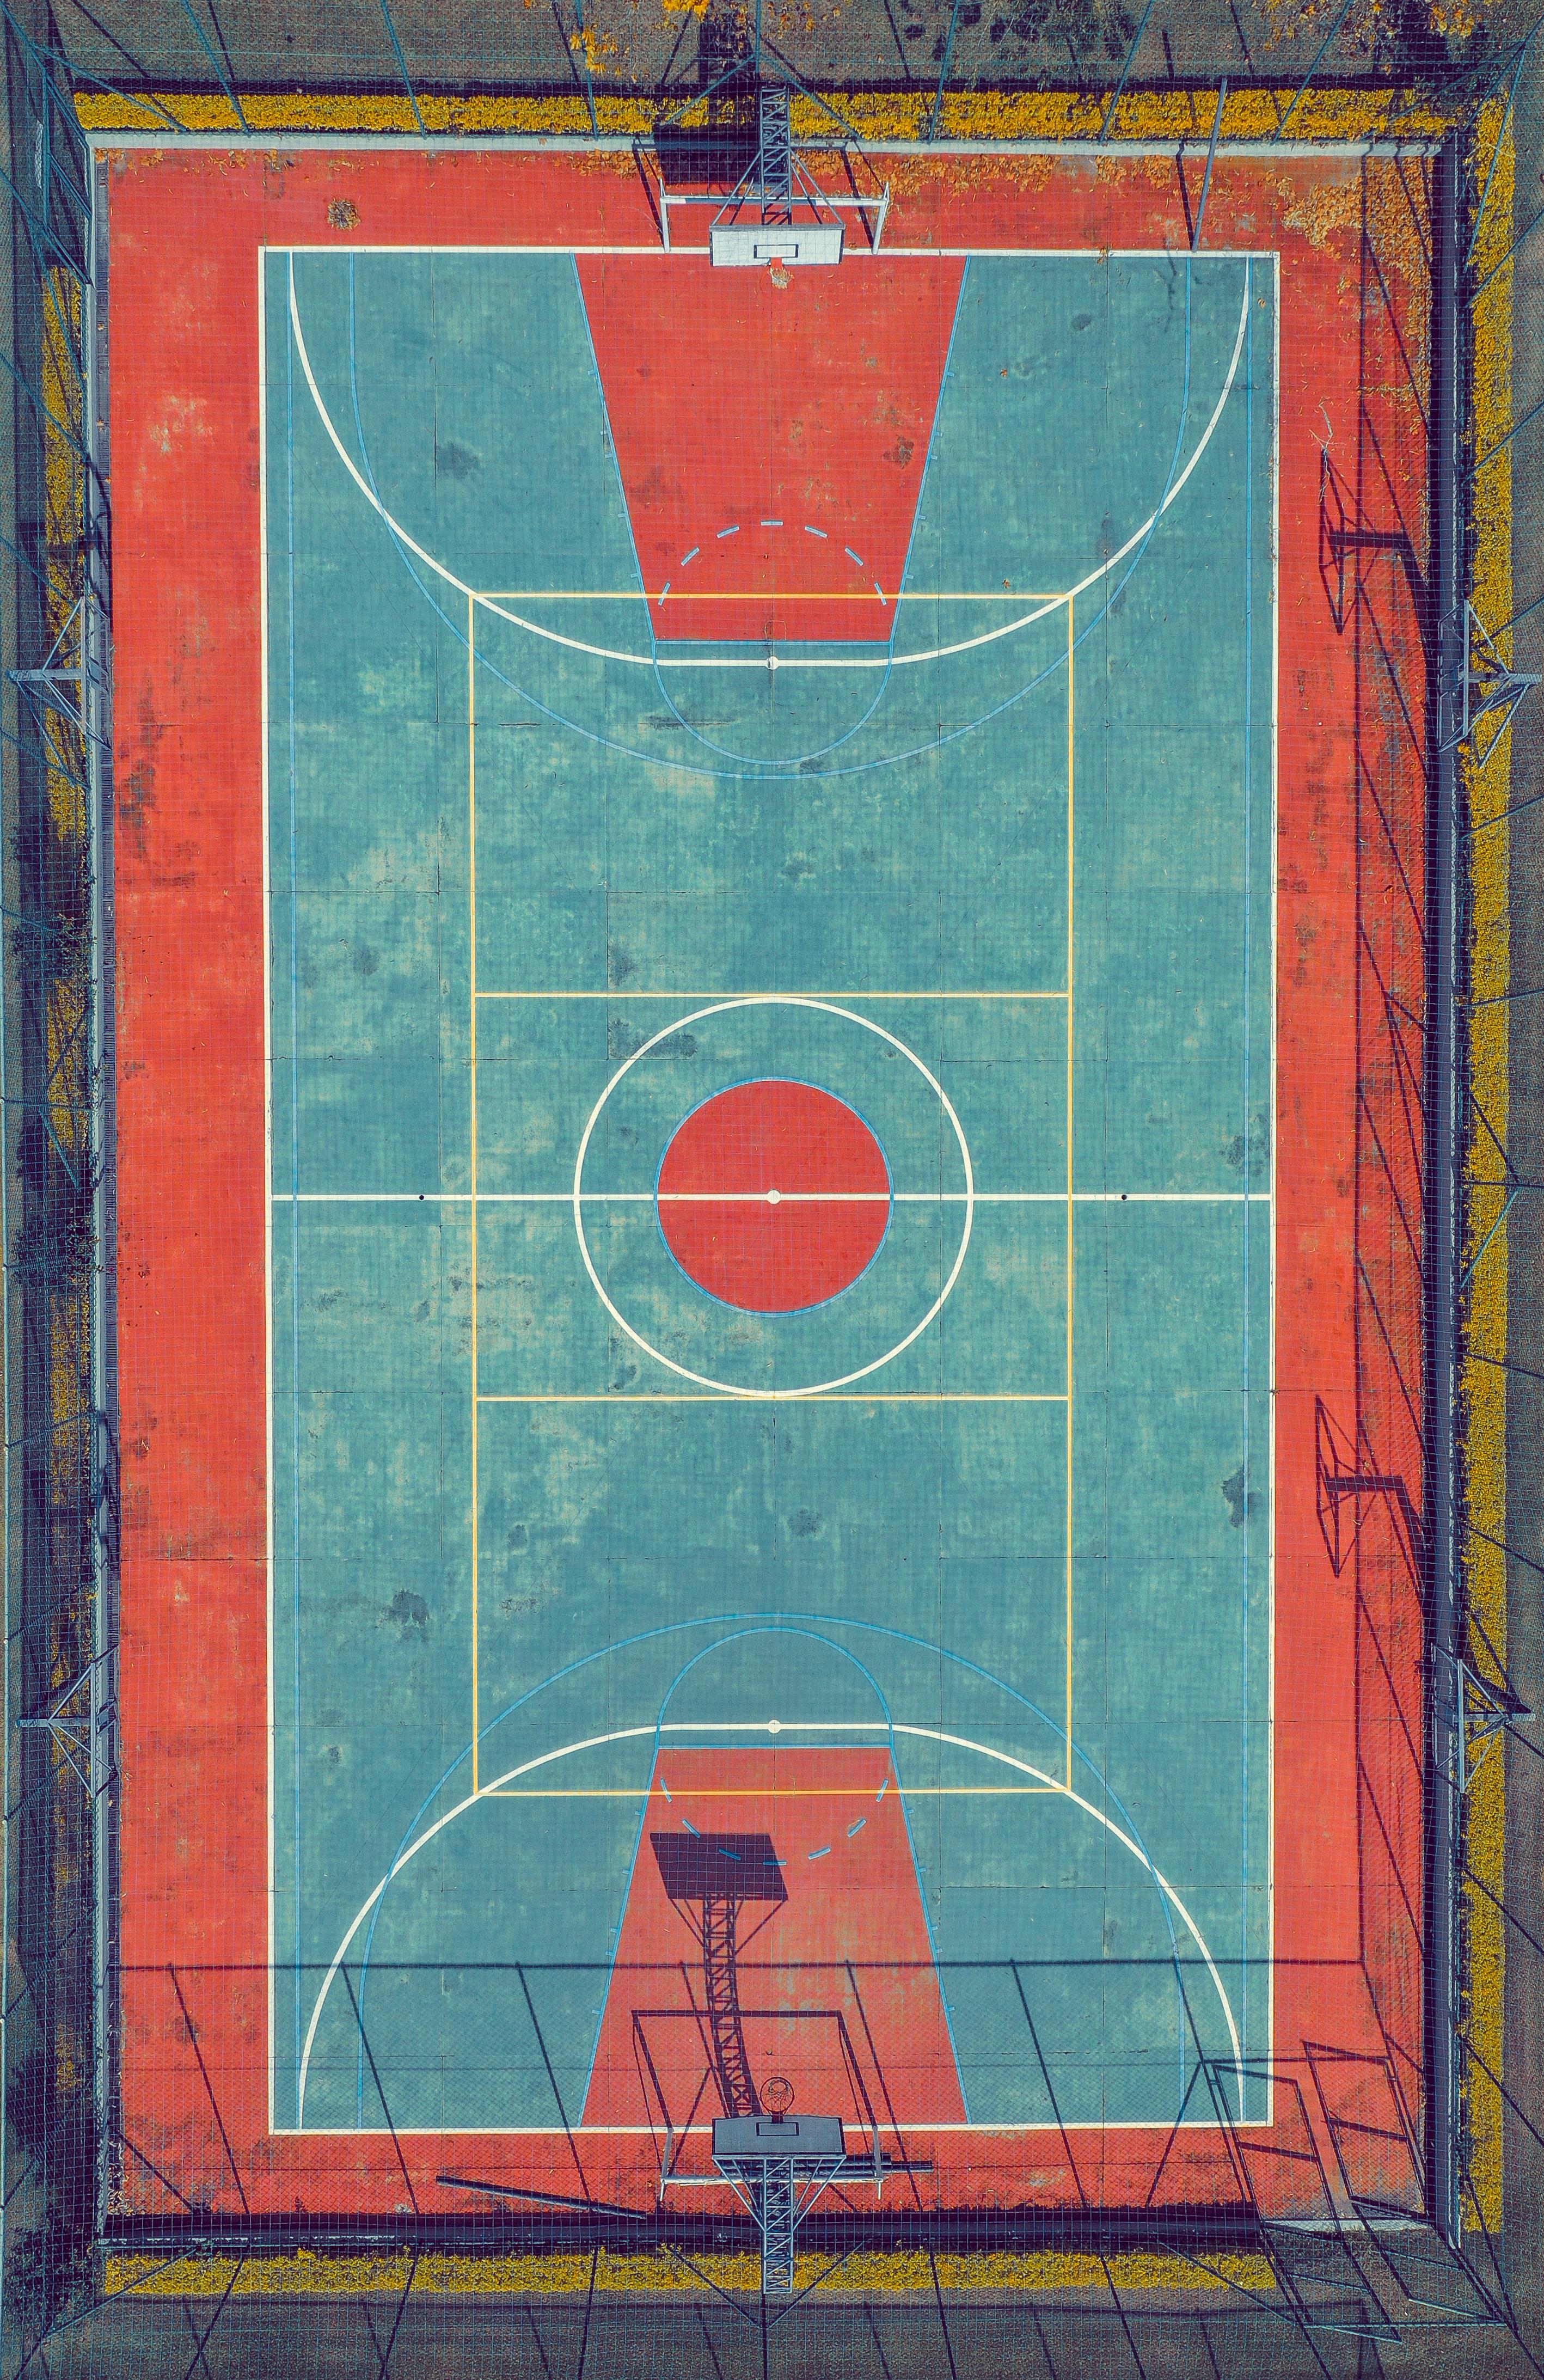 Ukuran Standar Lapangan Basket : ukuran, standar, lapangan, basket, Ukuran, Lapangan, Basket, Standar, Internasional,, Nasional,